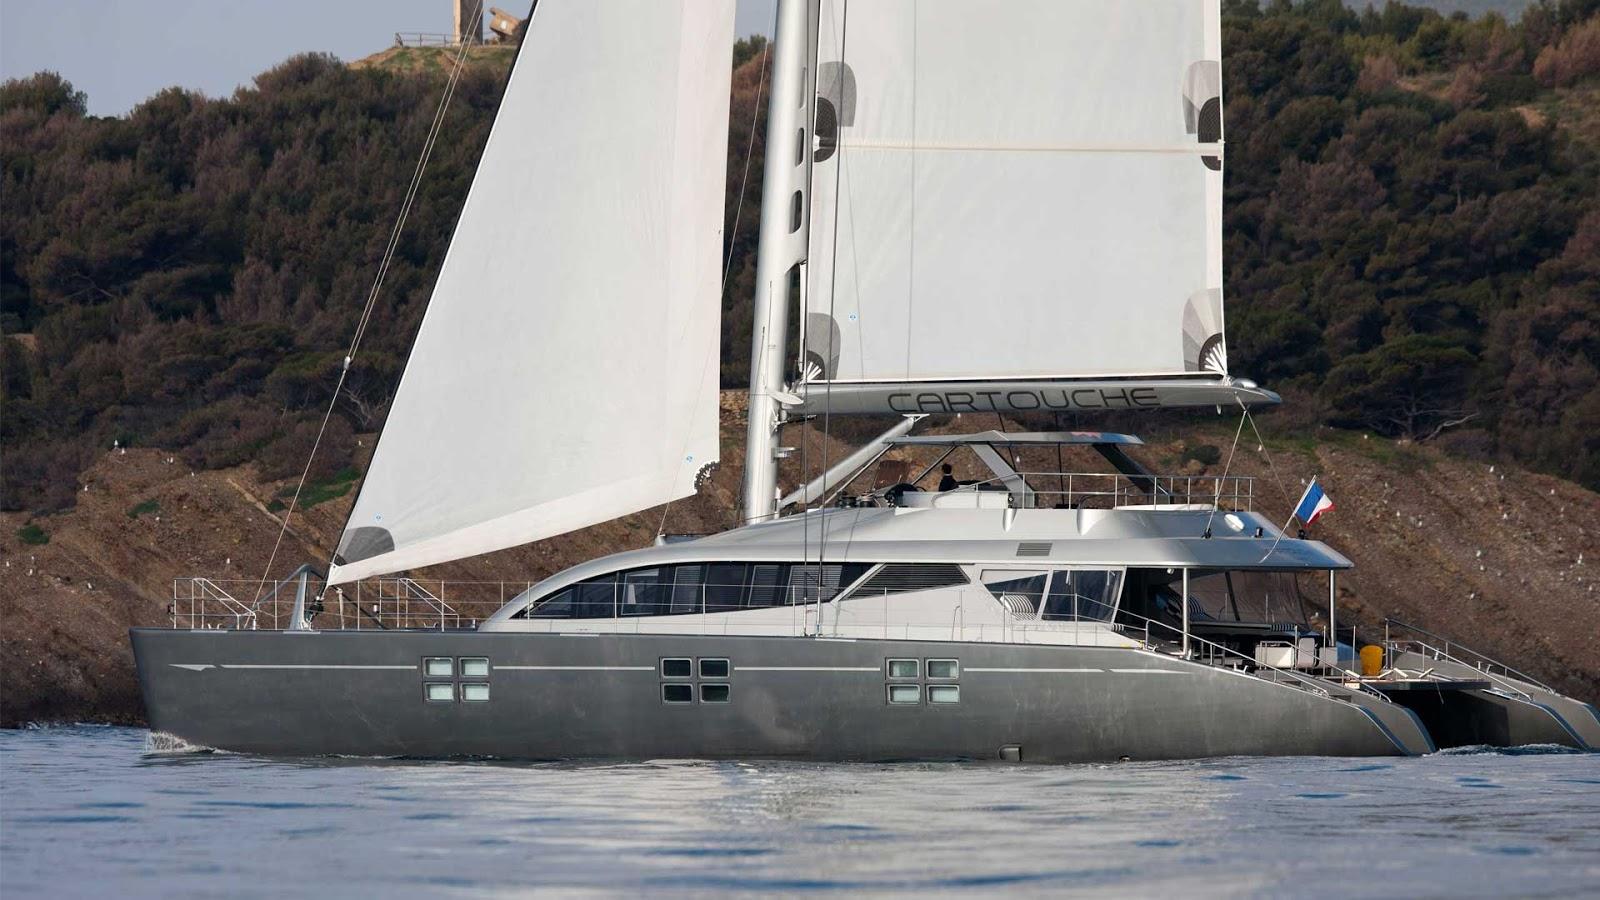 Alquiler de catamaranes baratos. Alquilar catamaran de lujo